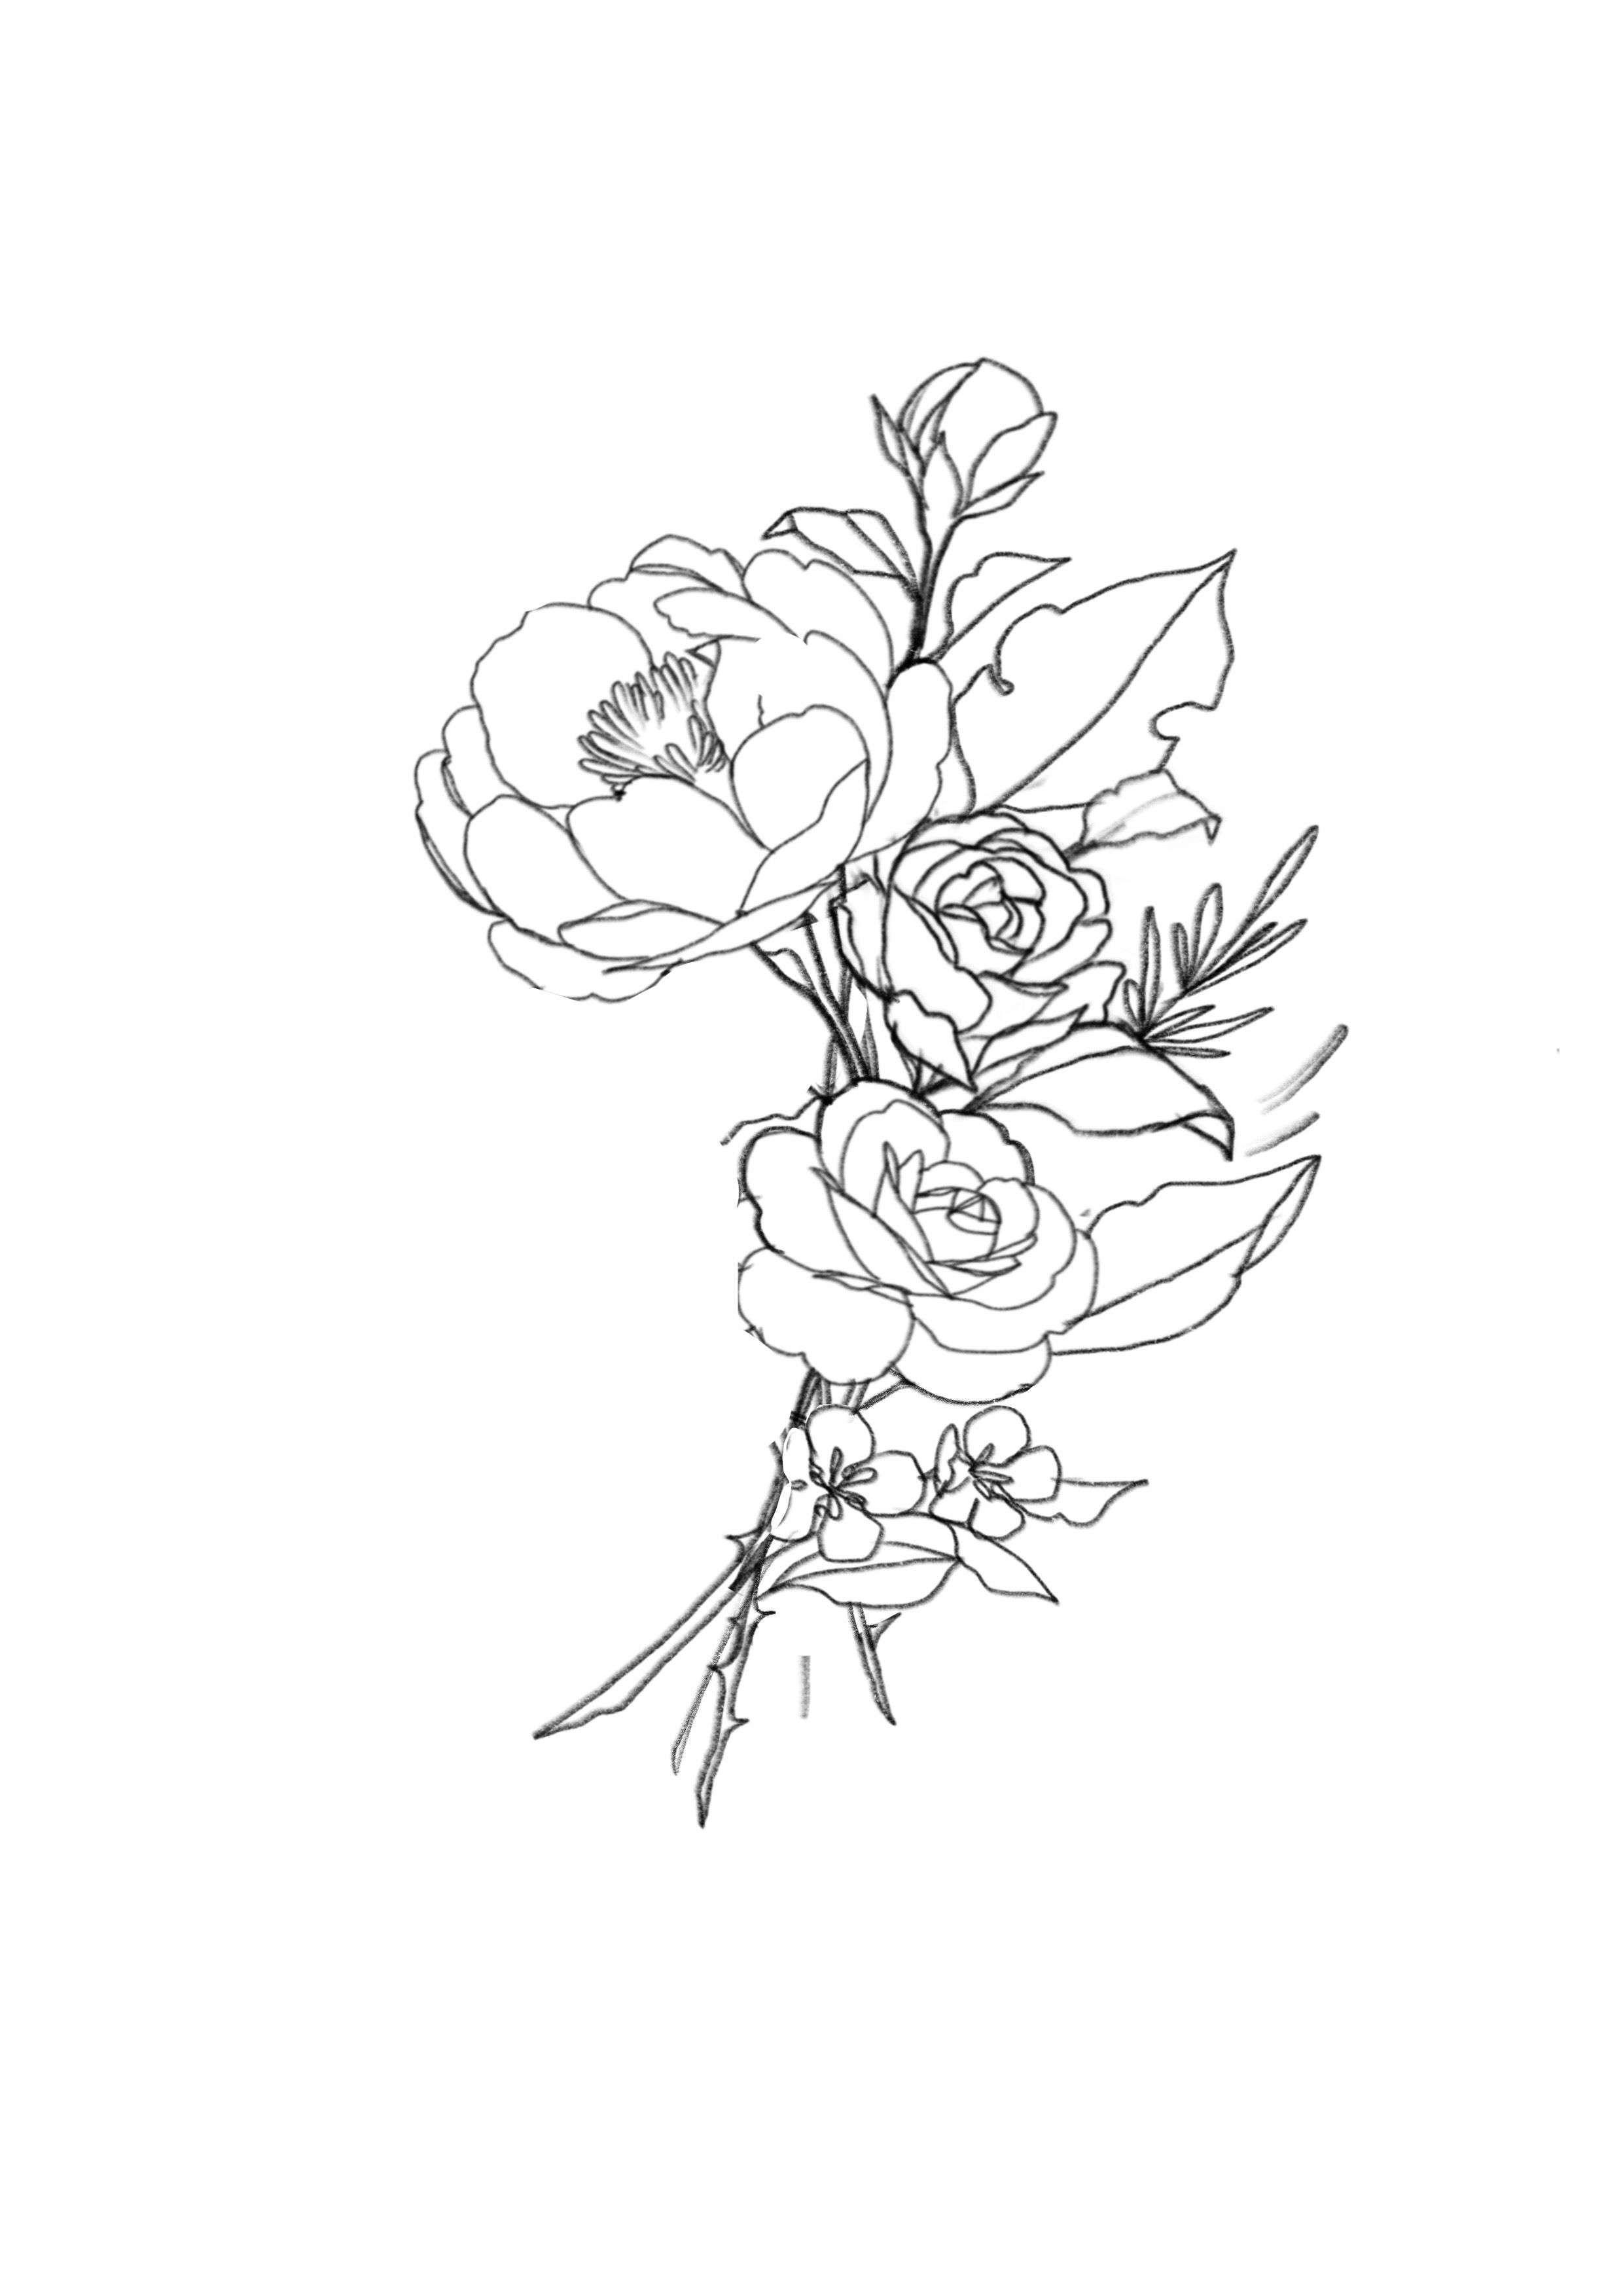 Inspiration for Cute Simple Mini Flower Tattoo Ideas